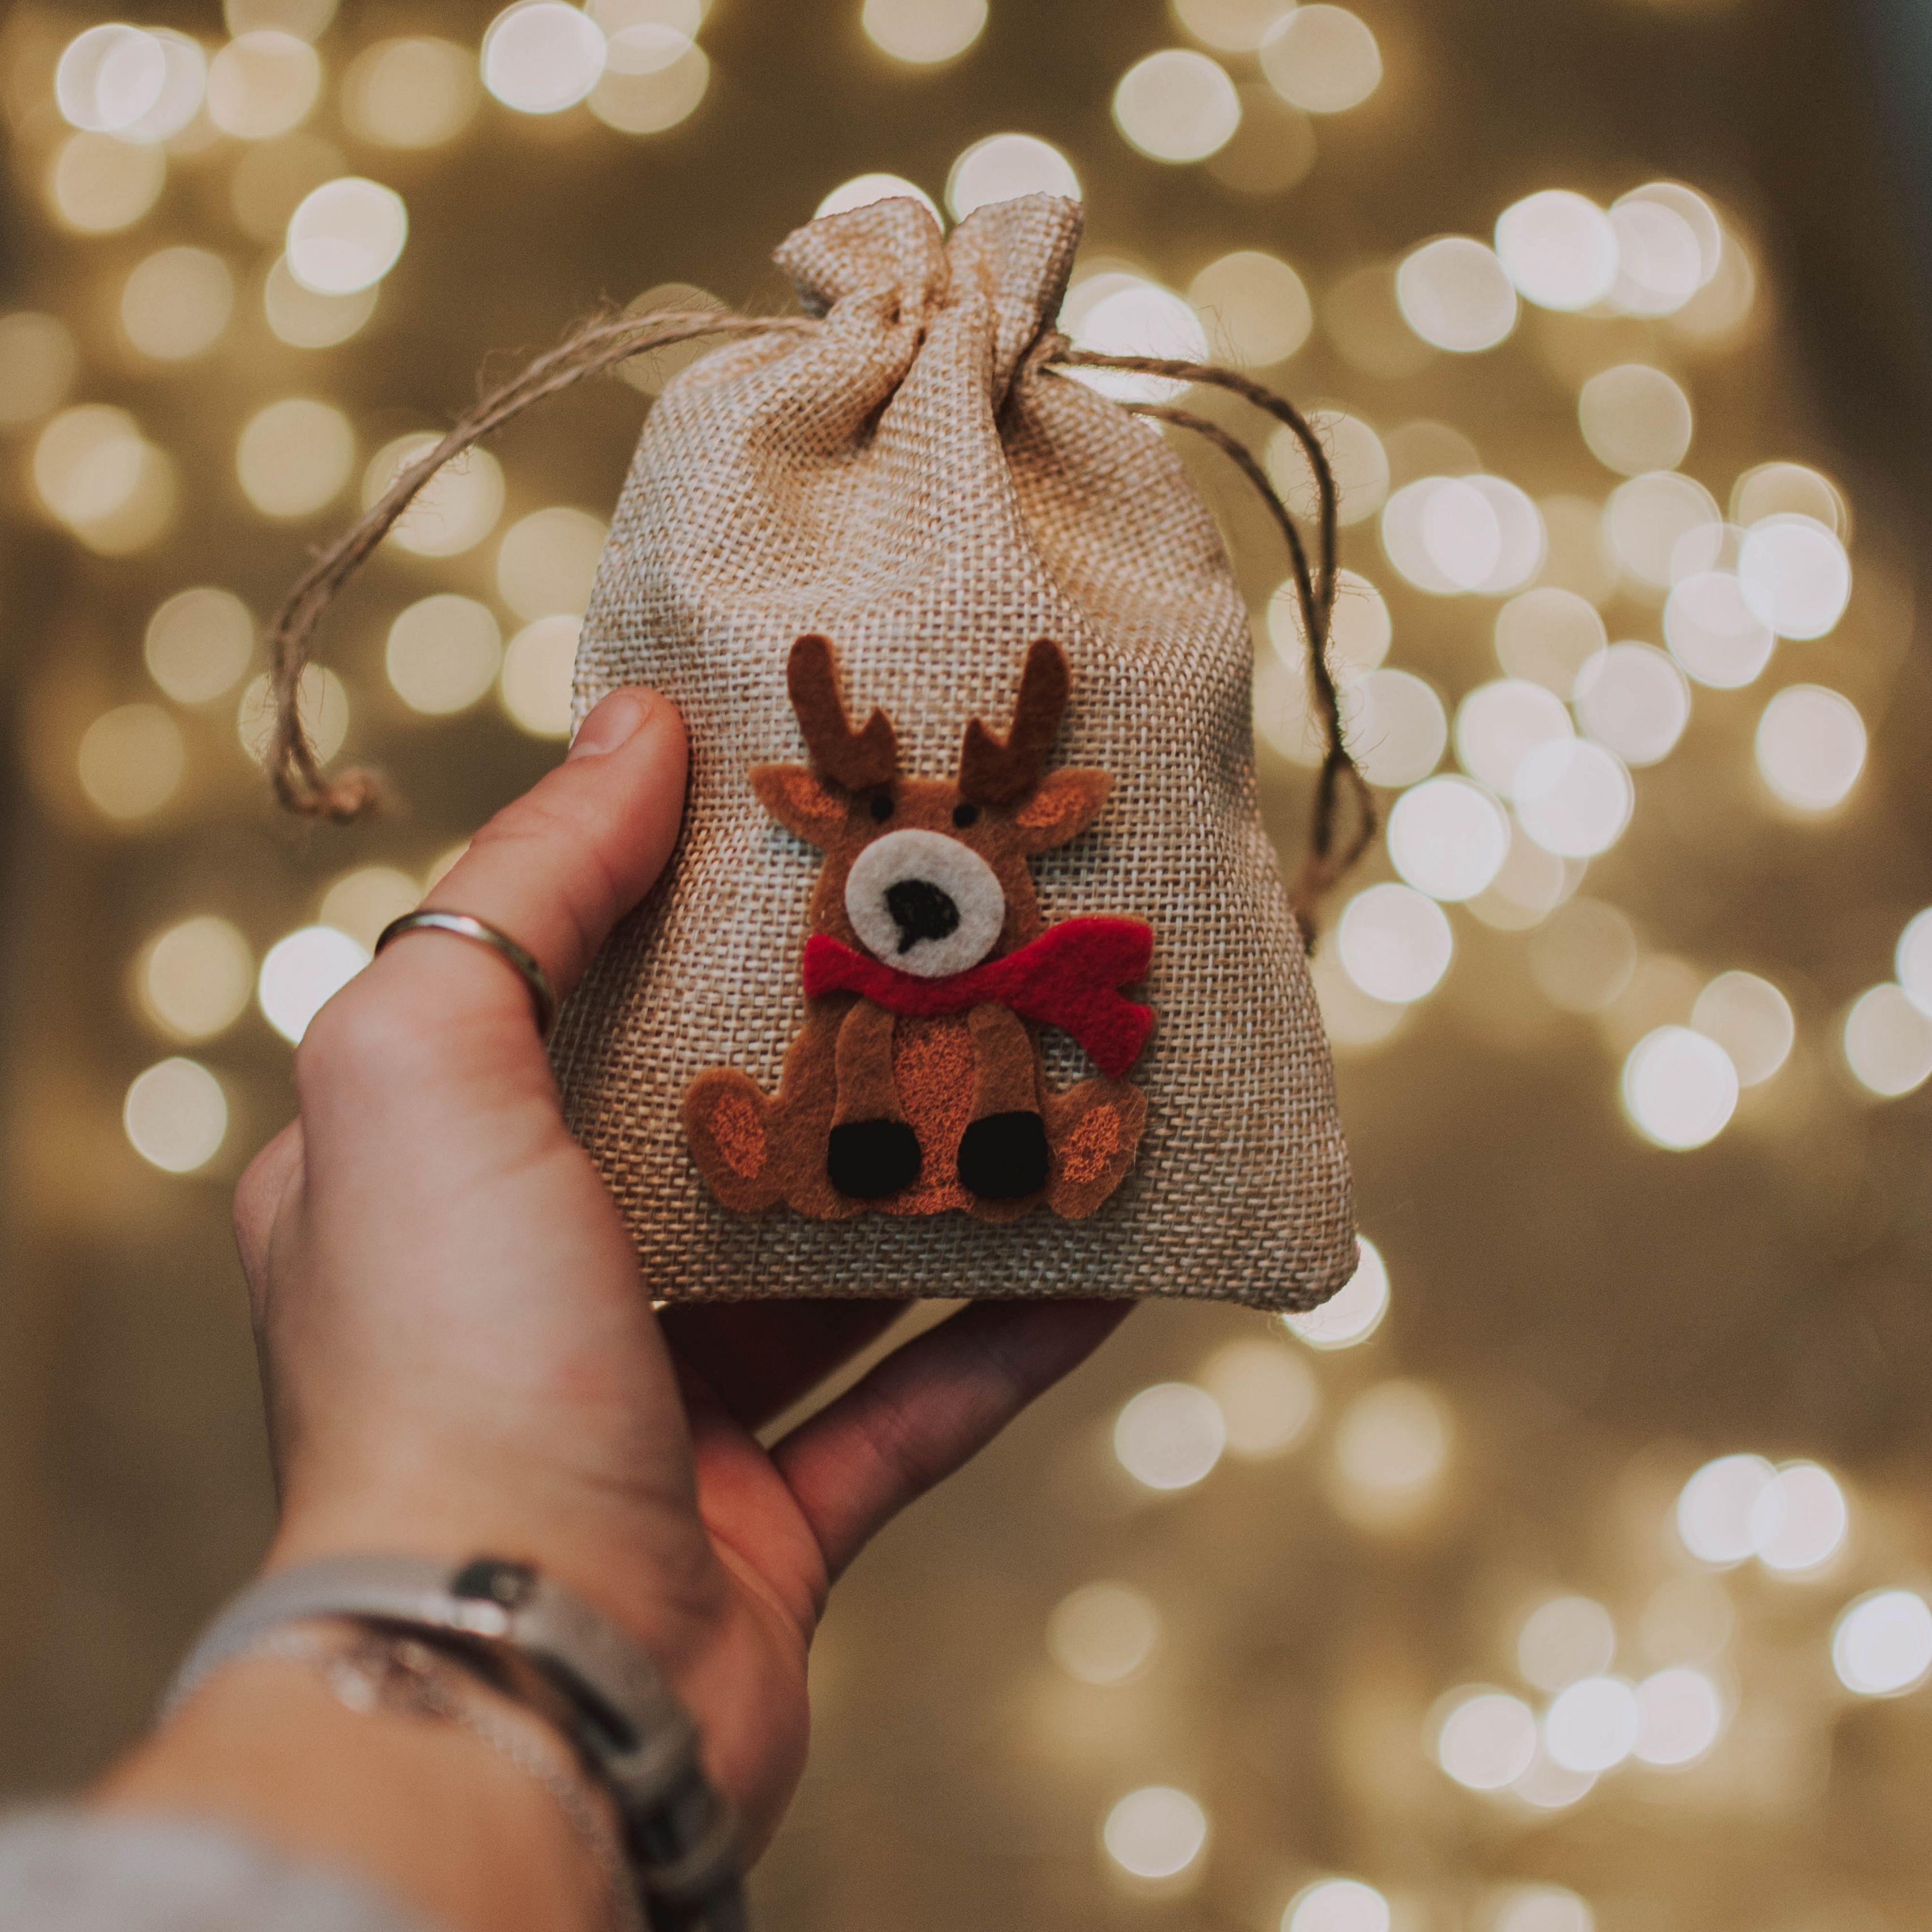 3415x3415 Wallpaper gift, new year, christmas, deer, hand